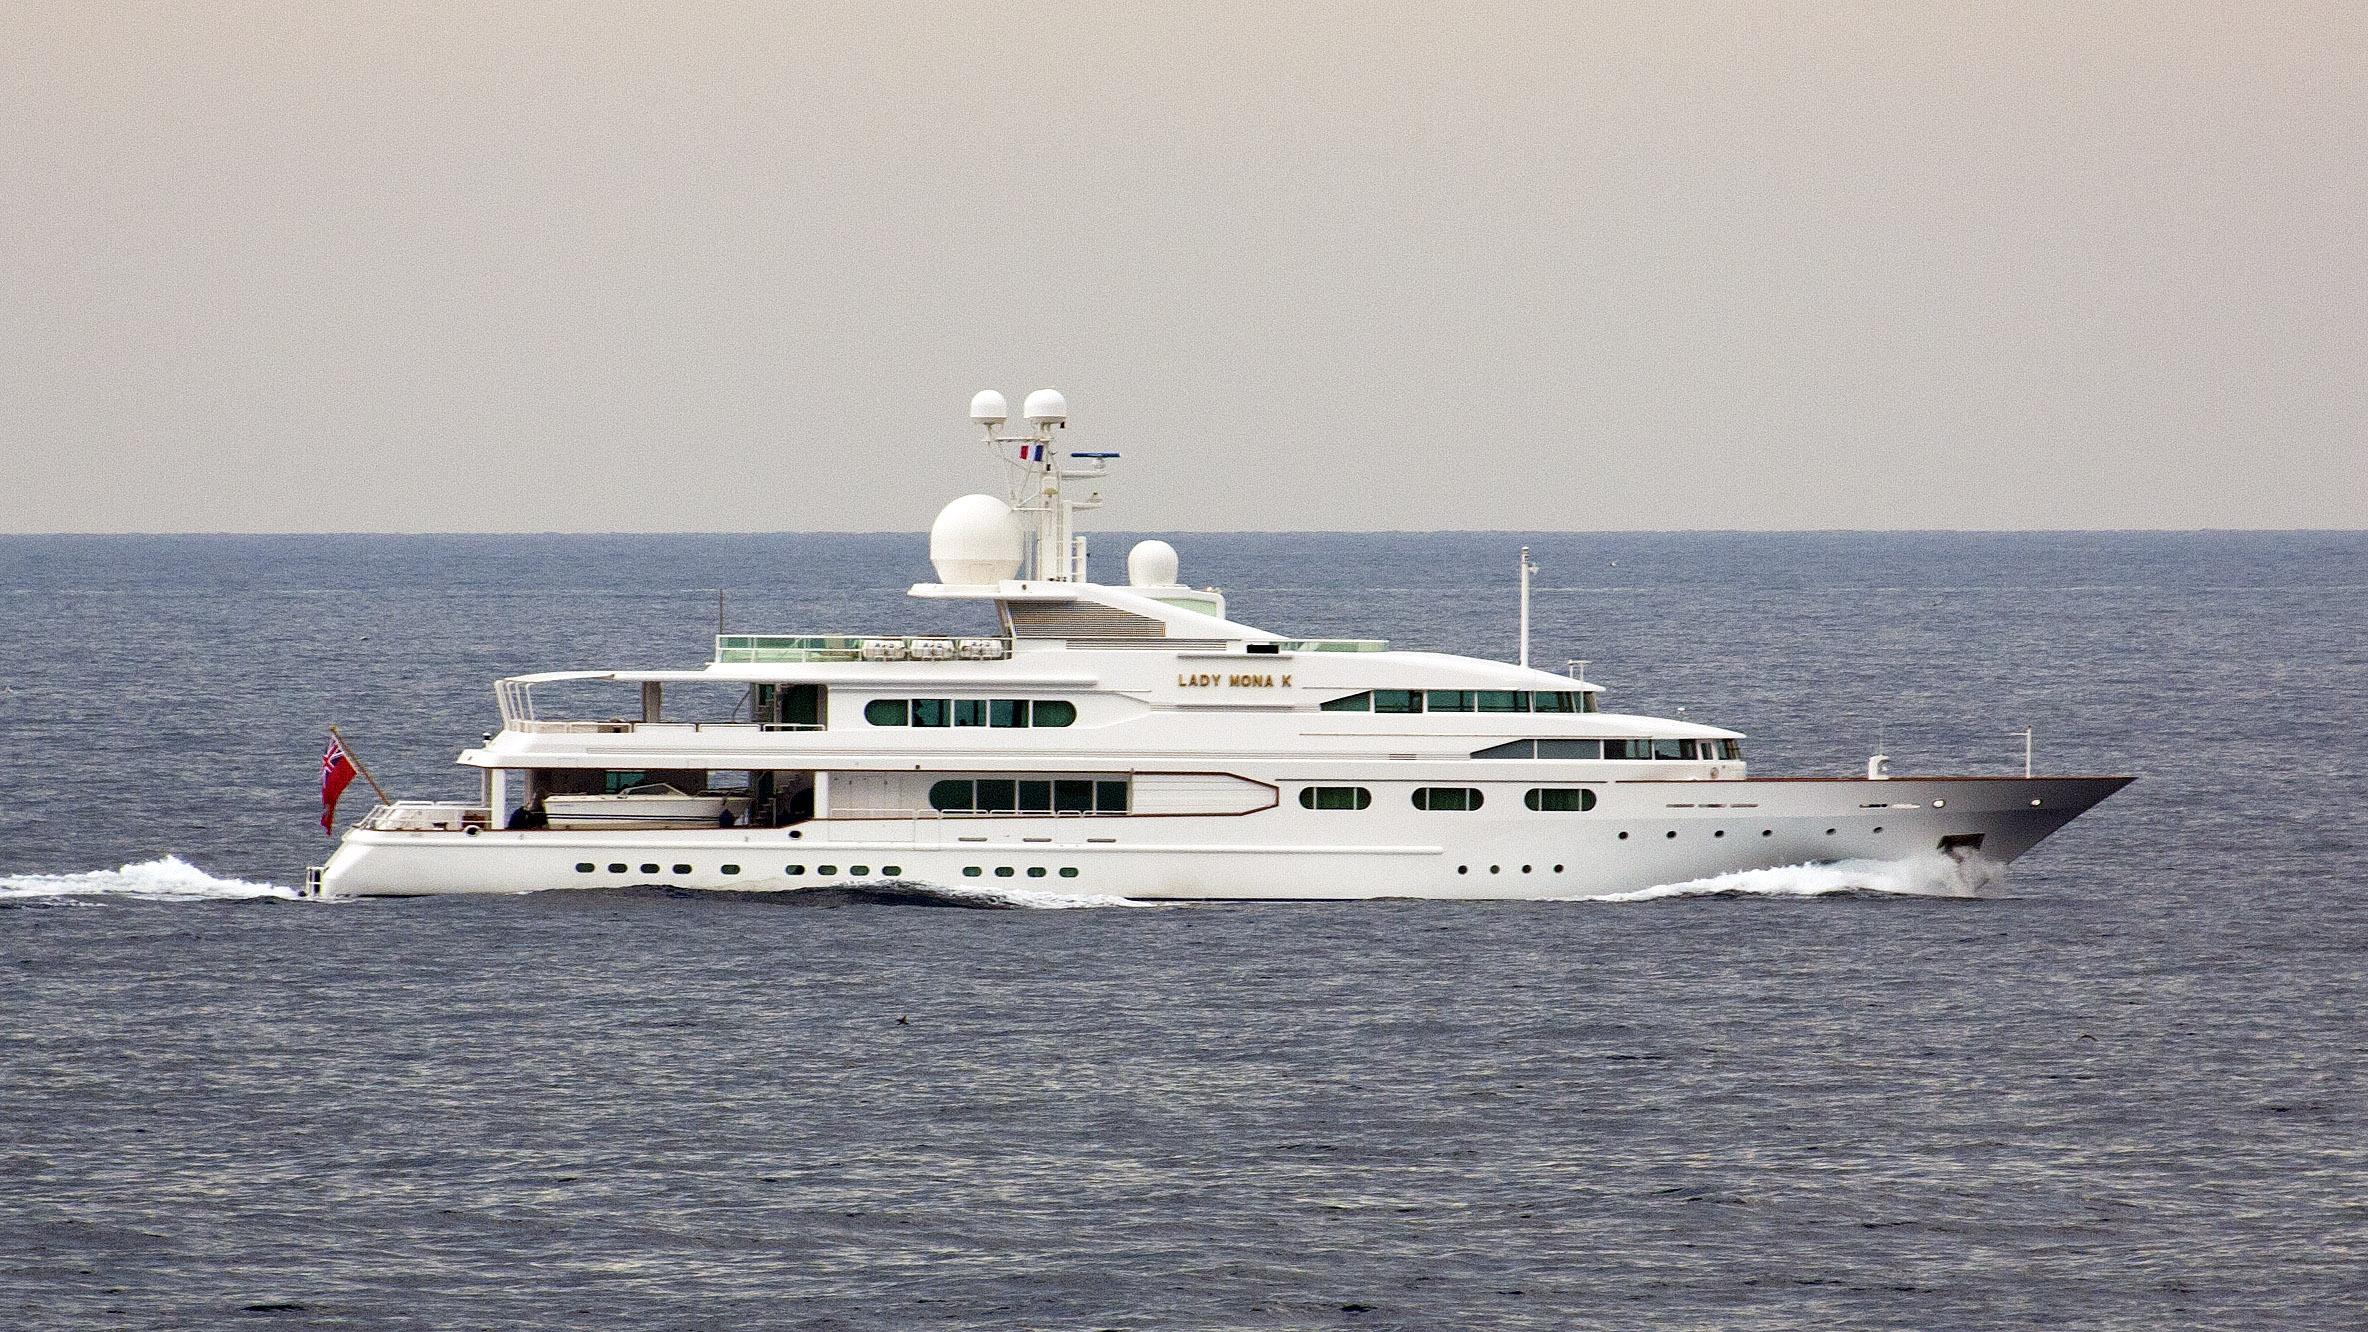 dancing hare lady mona k motor yacht amels 1986 58m cruising profile